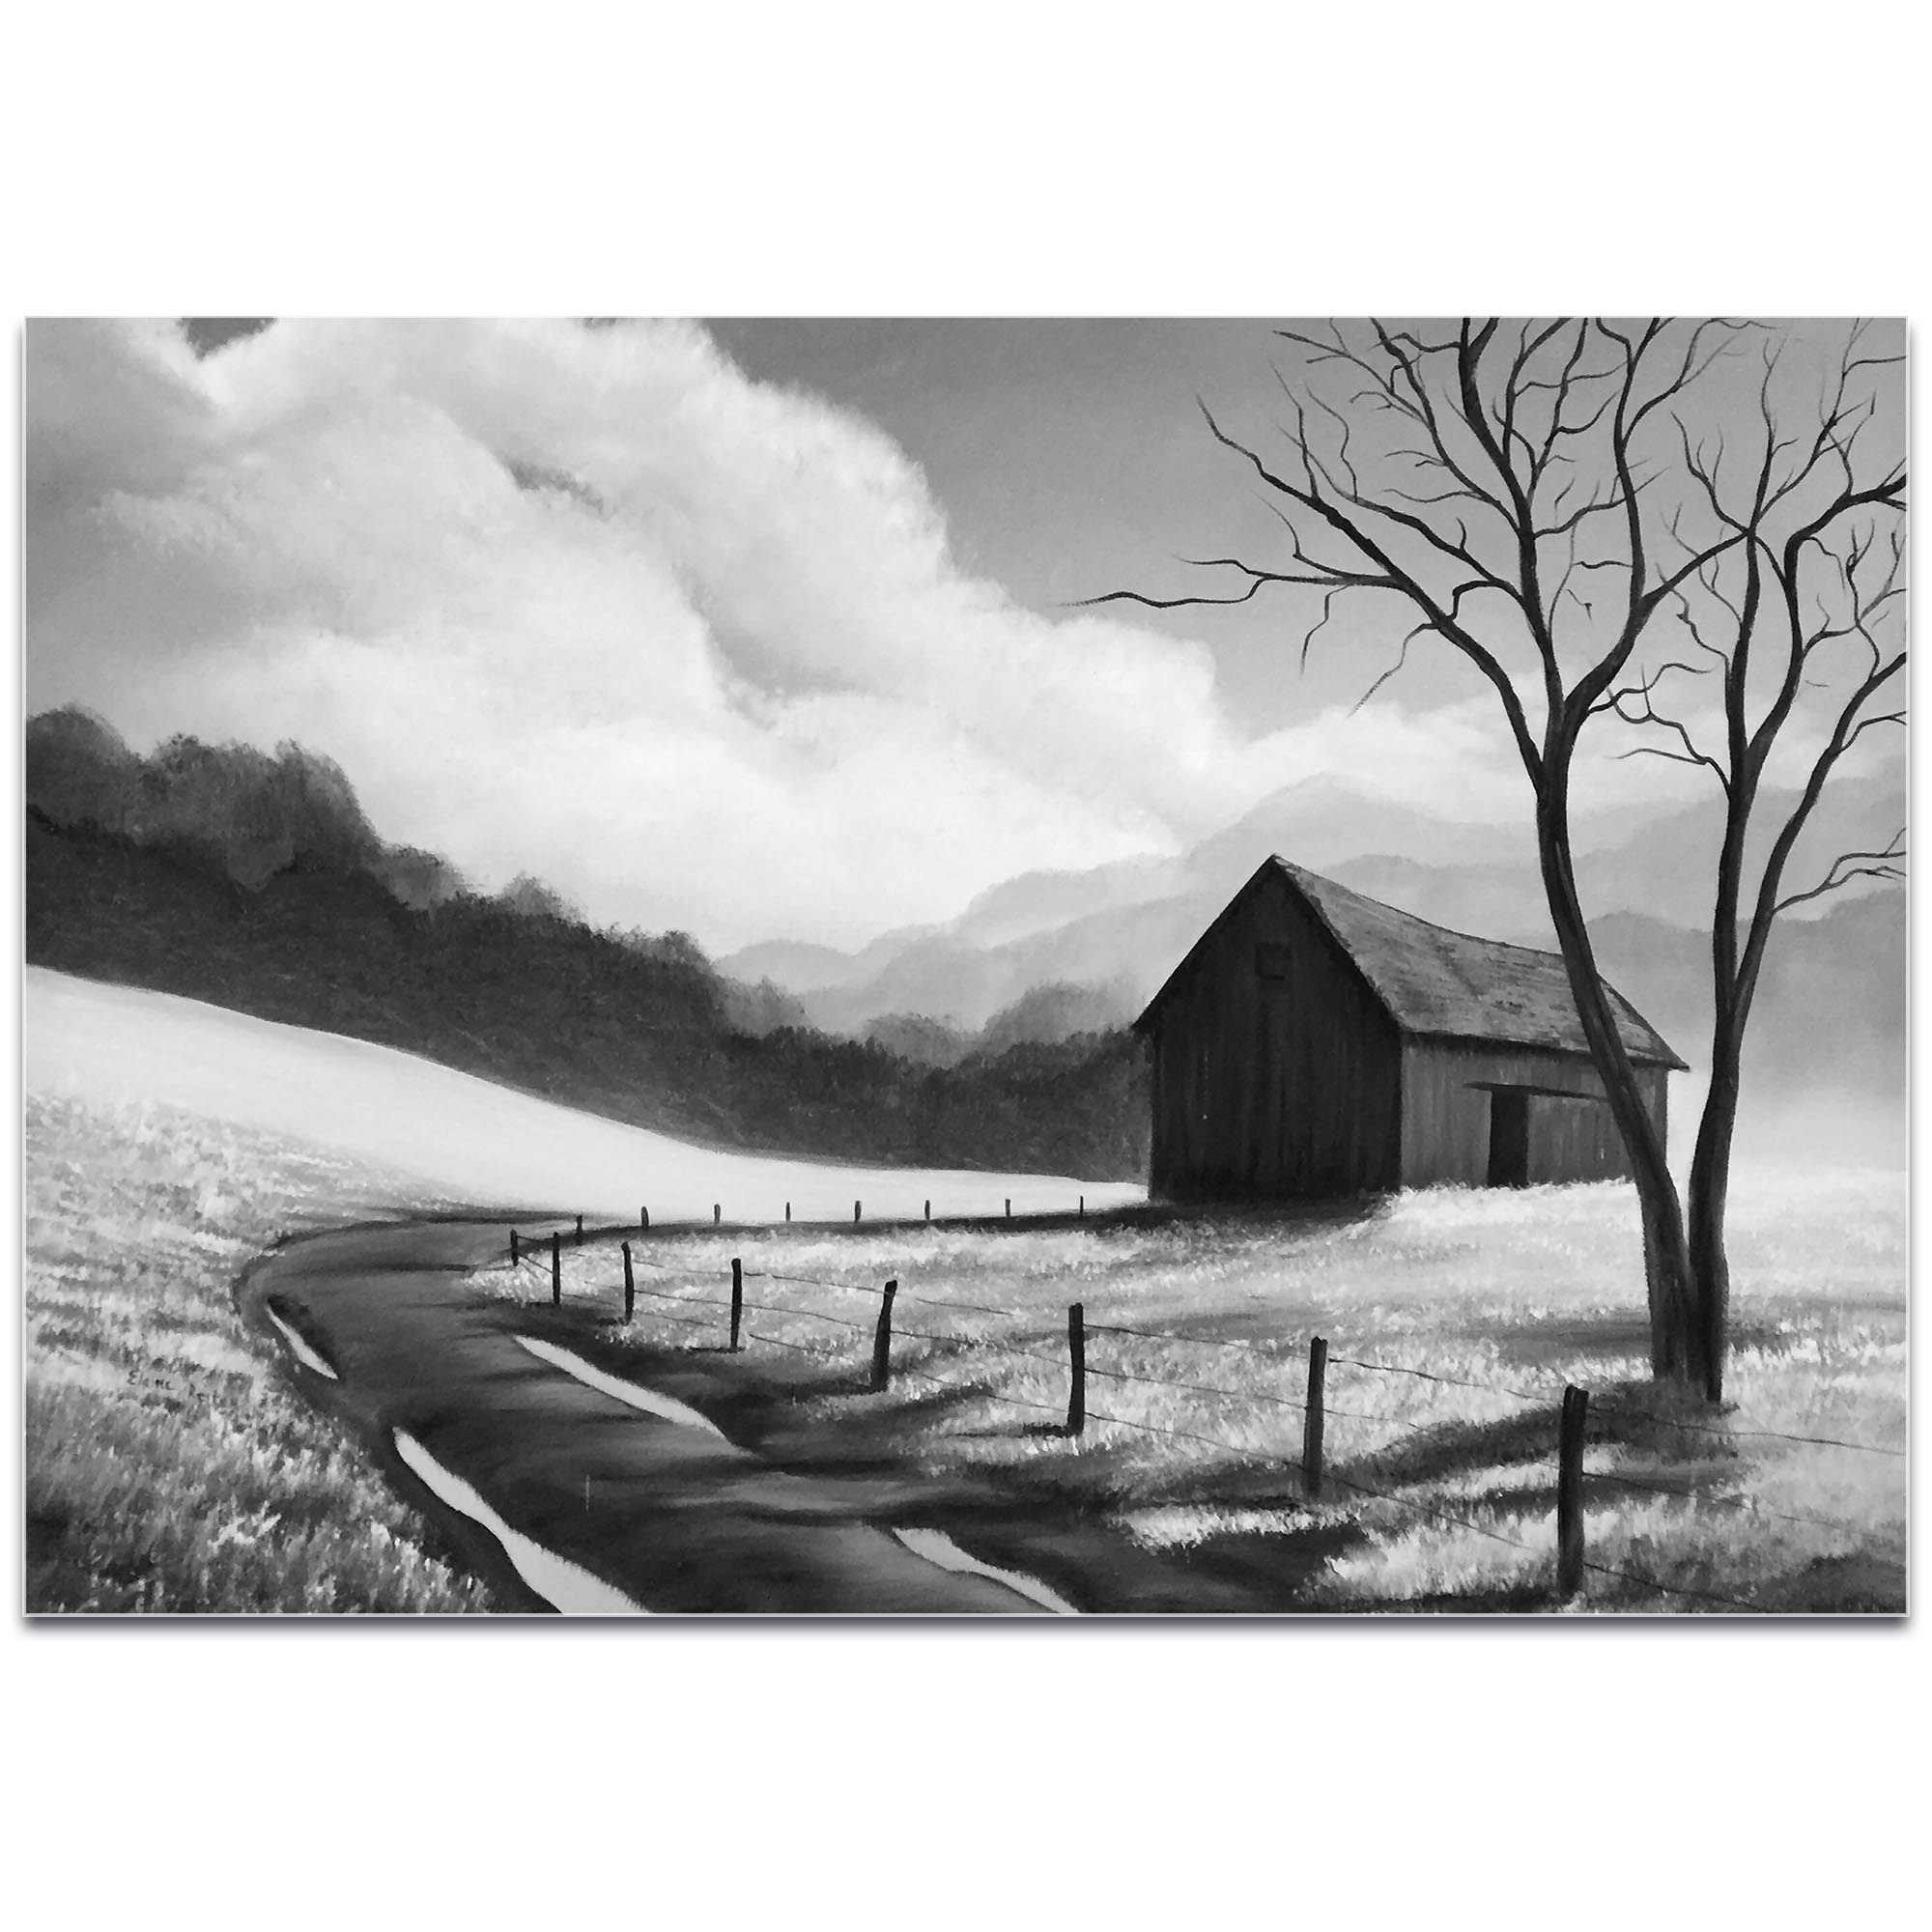 Western Painting 'Prairie Life' - Rustic Decor on Metal or Acrylic - Image 2